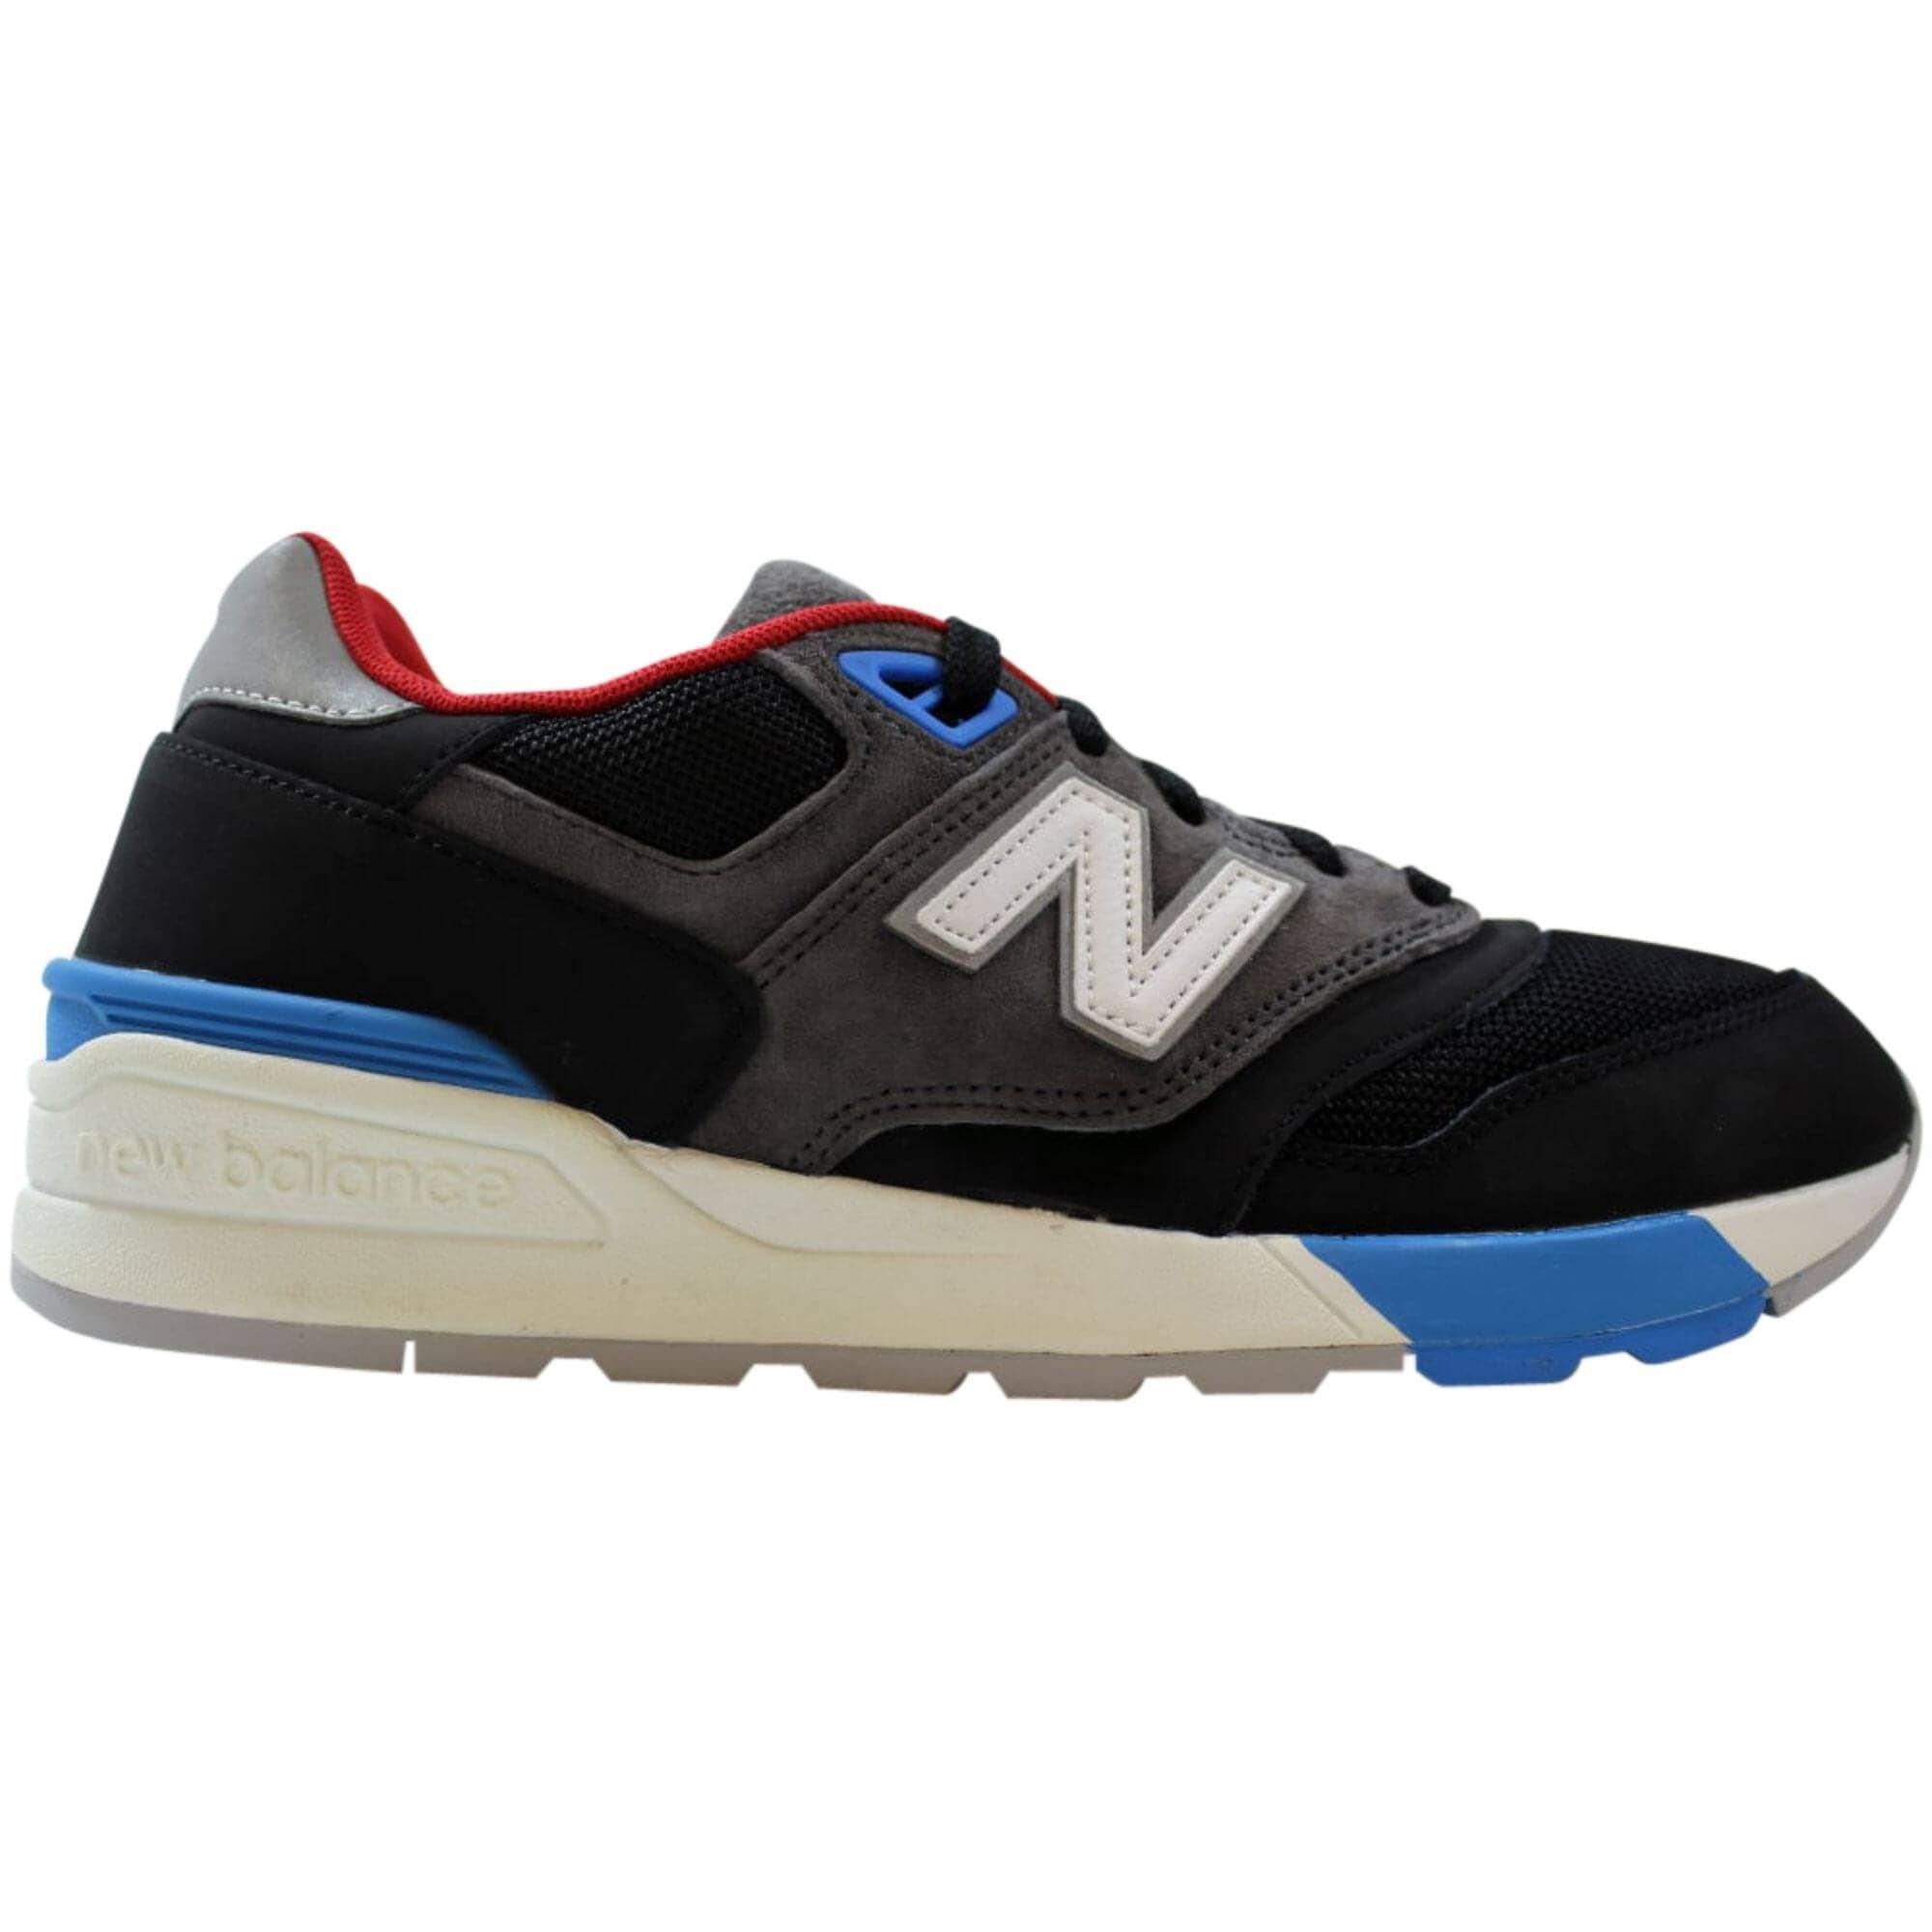 New Balance 597 Vac Ankle-High